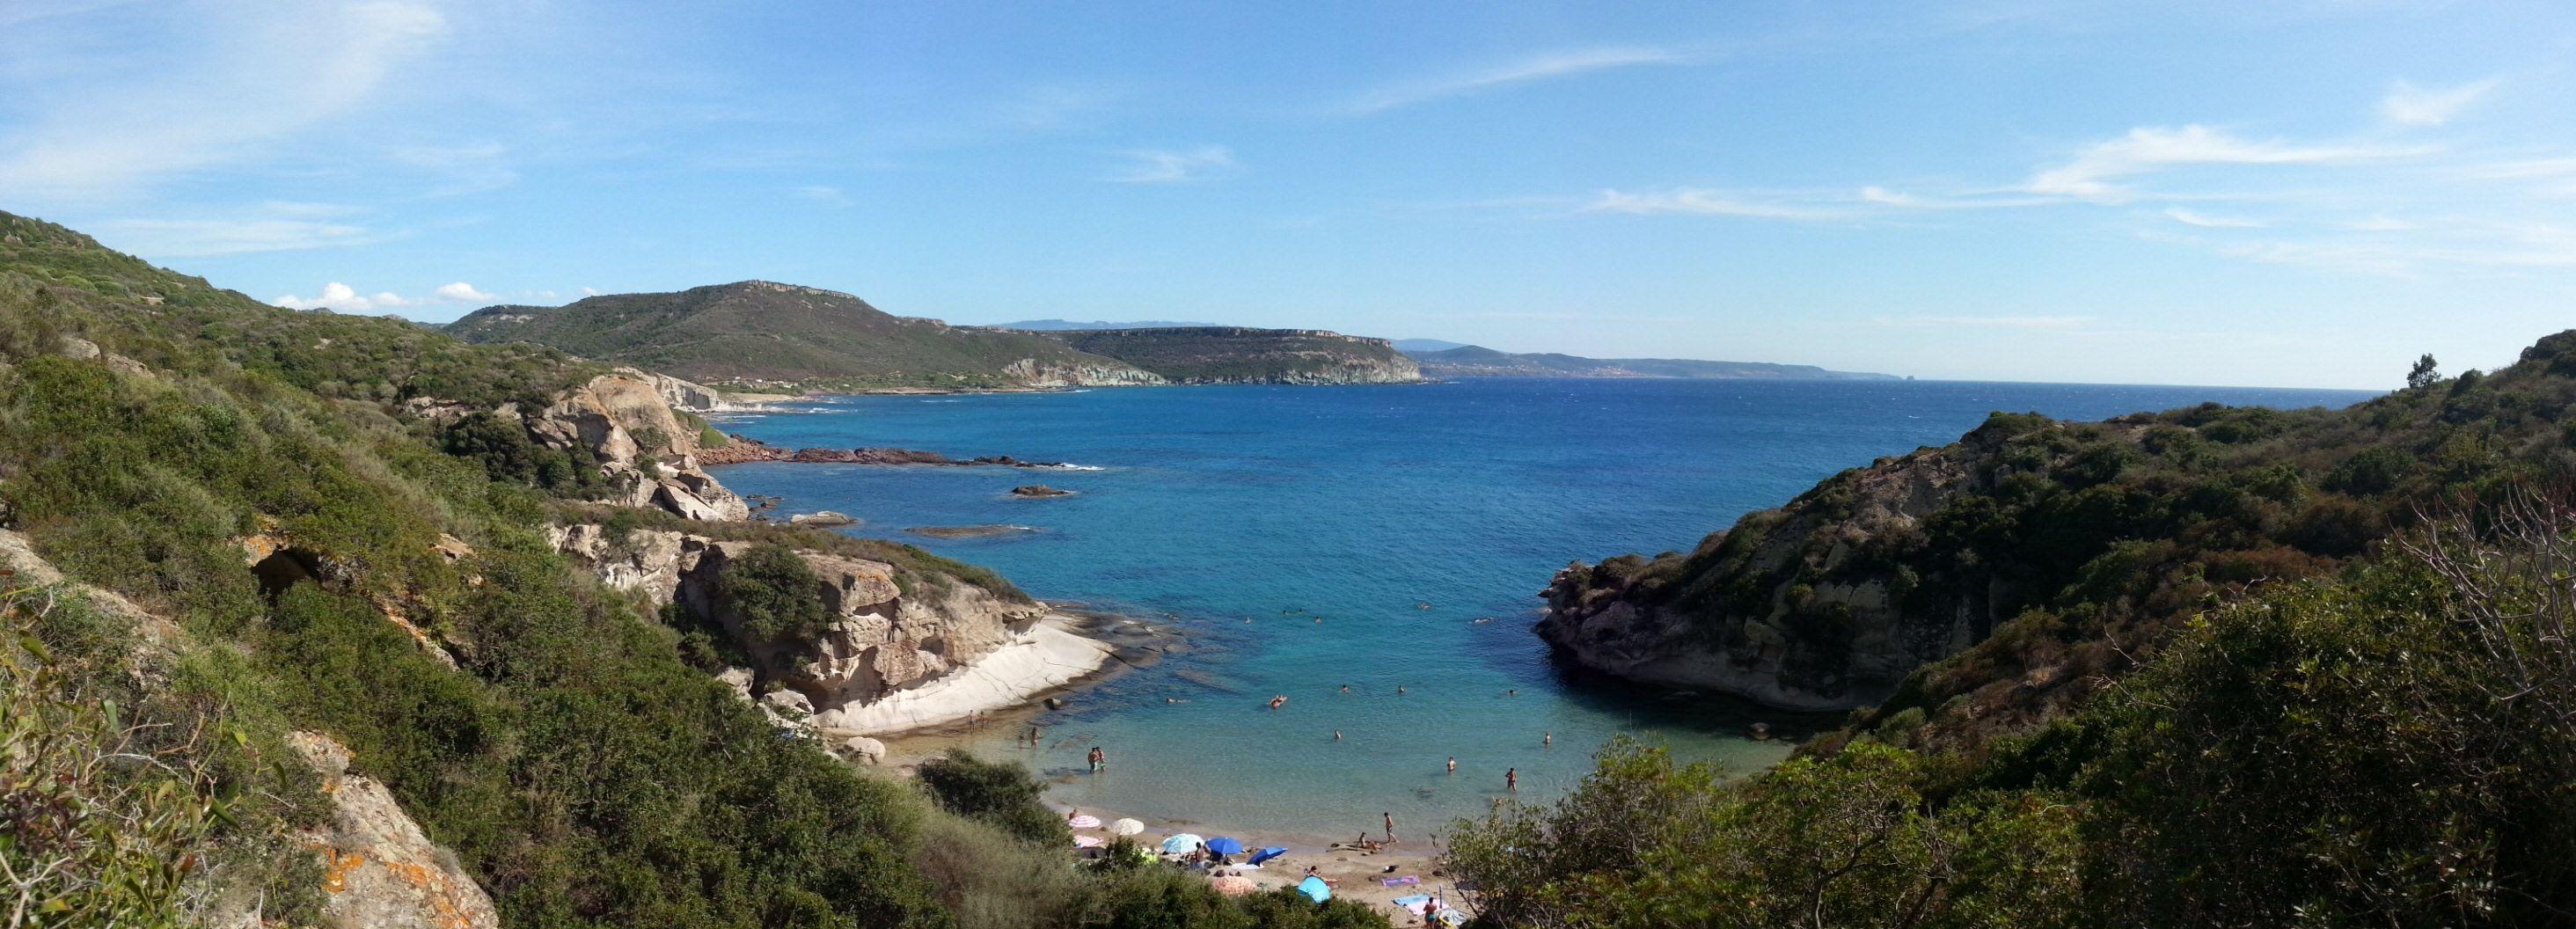 Cumpultittu, Sardegna, 2015